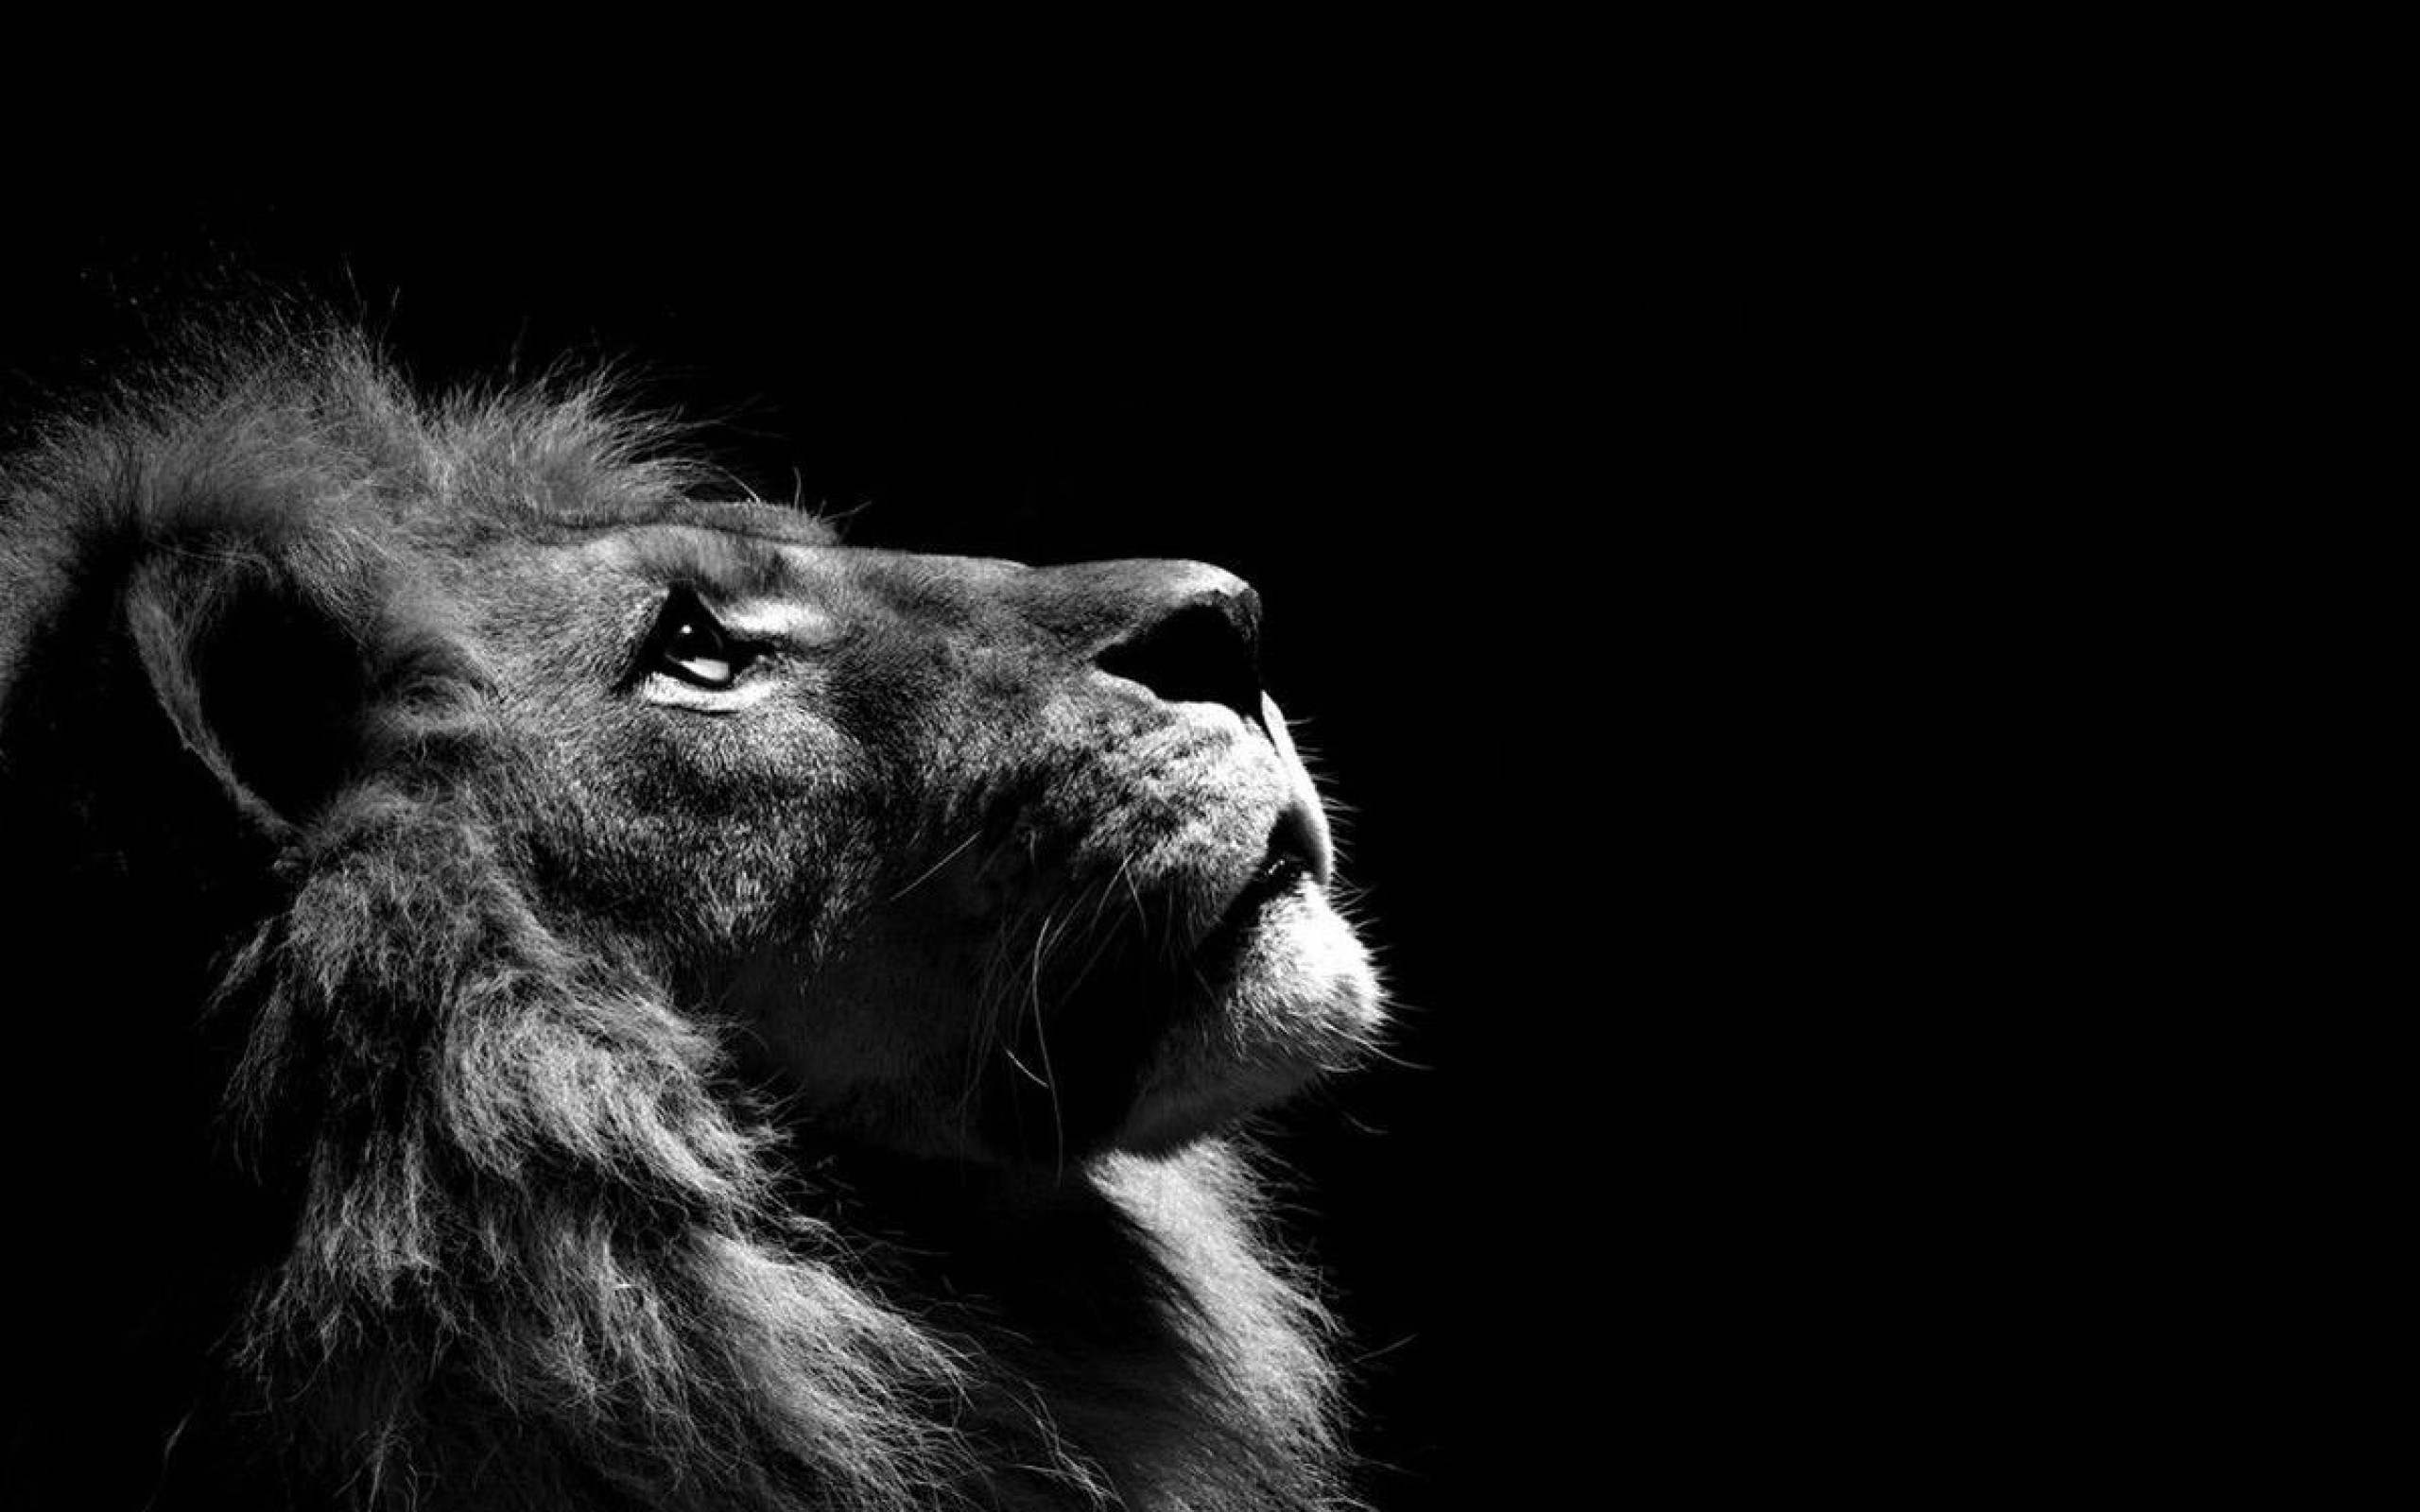 lion animal image HD wallpaper Wallpaper